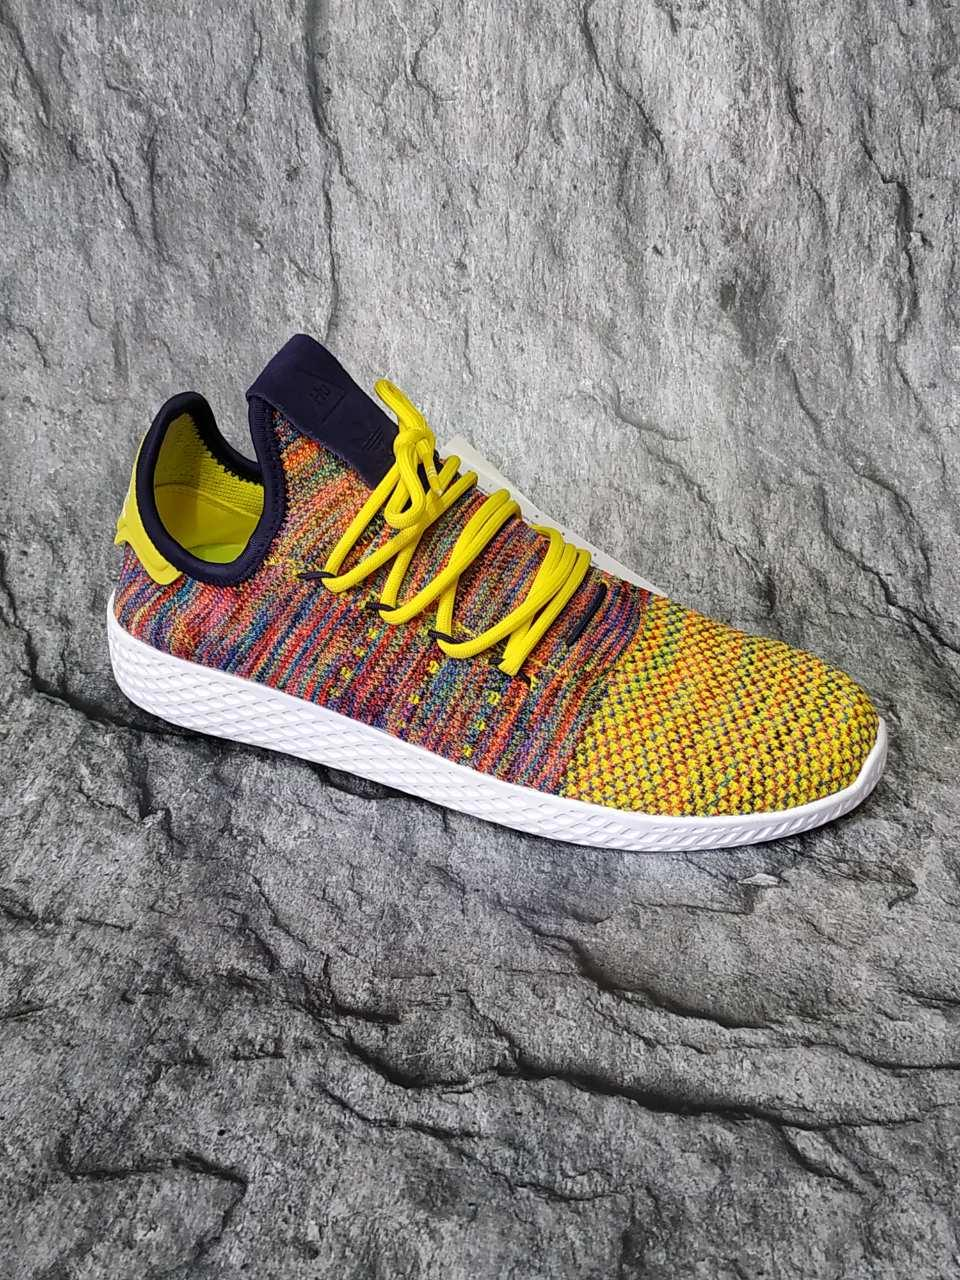 Кроссовки adidas x Pharrell Williams Tennis Hu Primeknit Semi Frozen Yellow (оригинал)